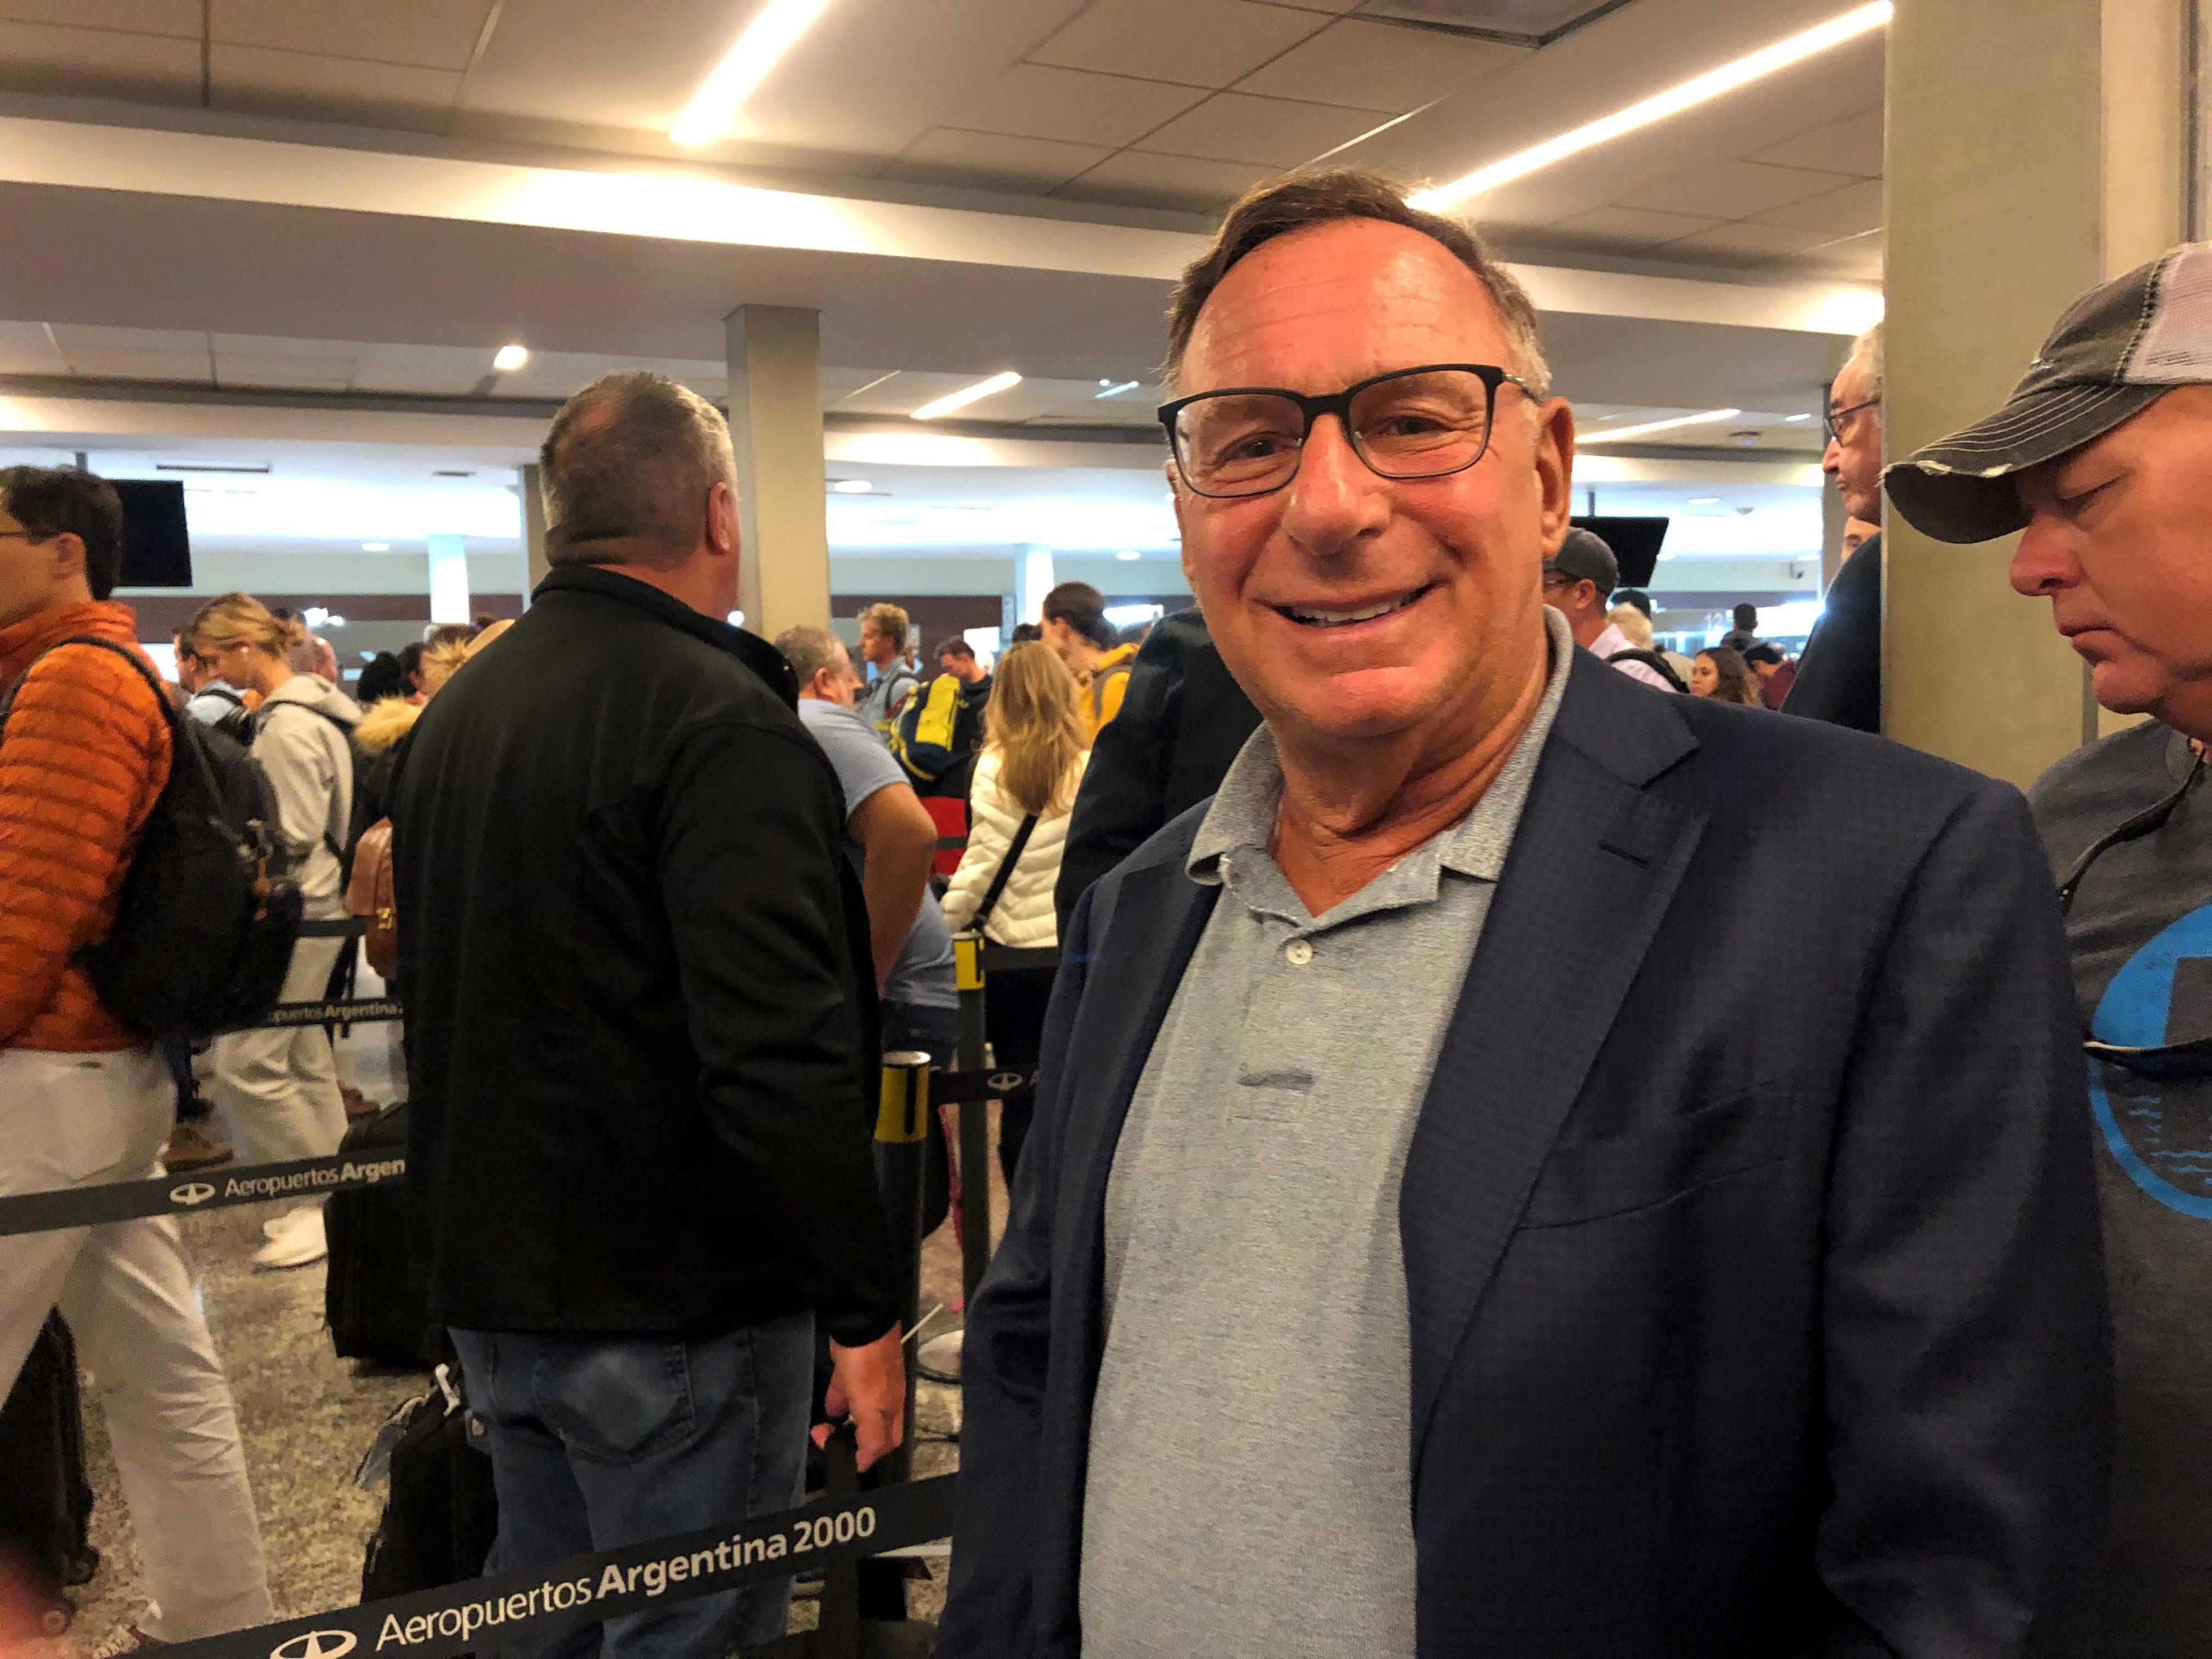 JFD President, Richard Levine